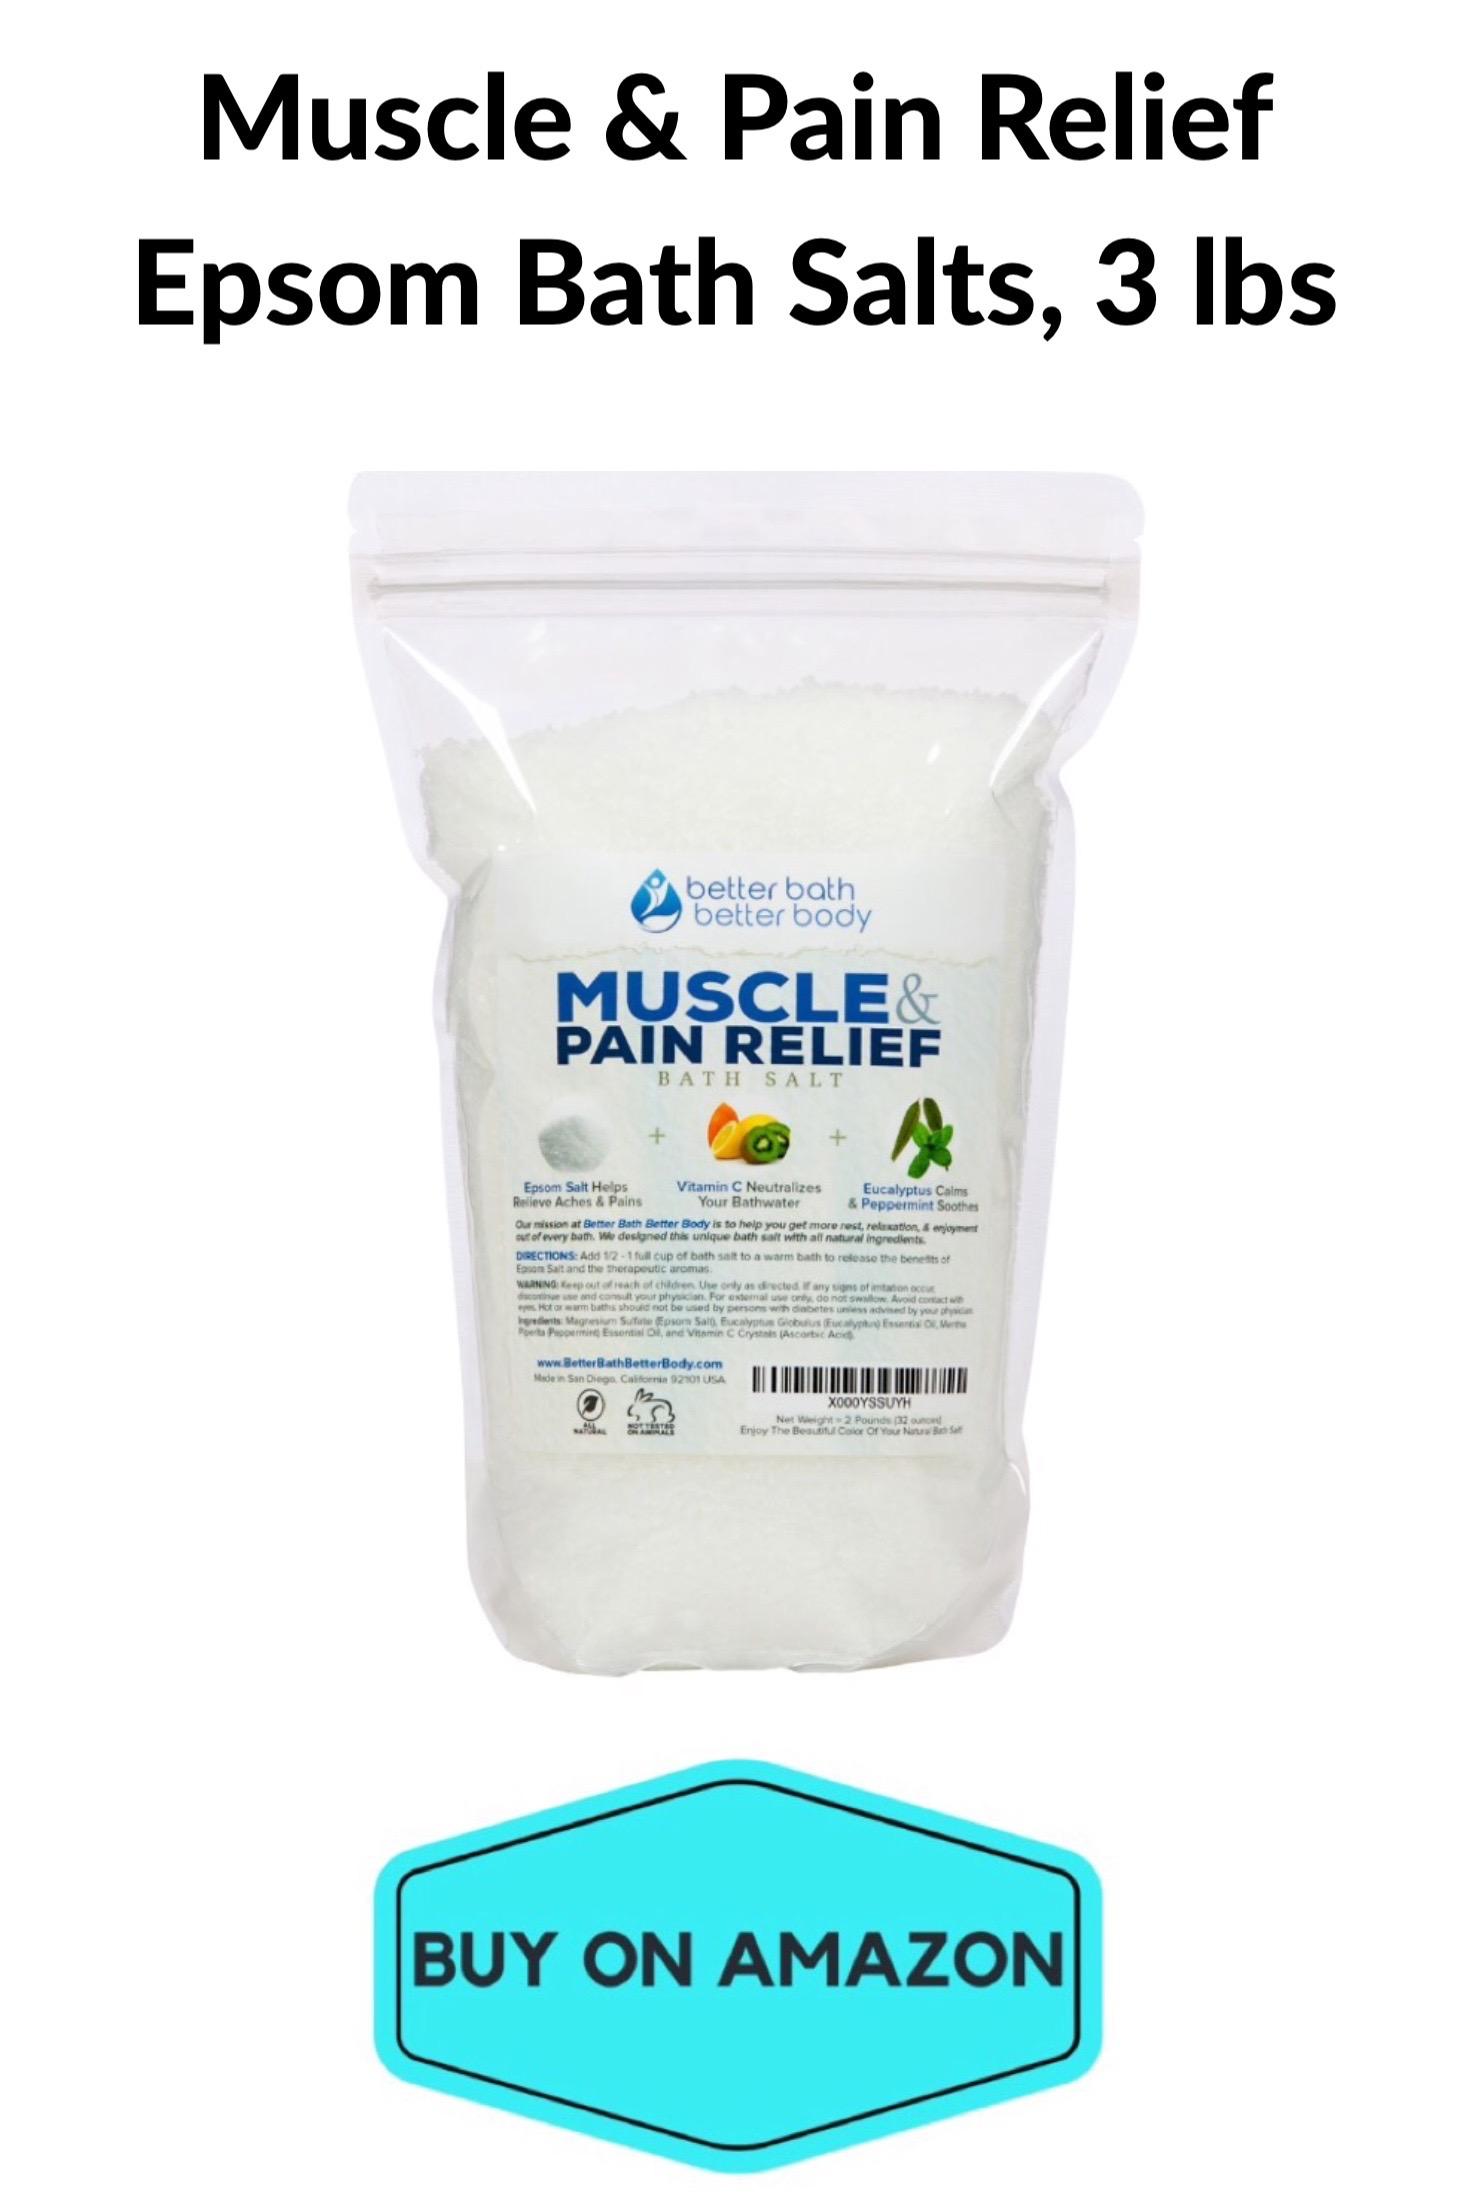 Muscle & Pain Relief Epsom Bath Salts, 3 lbs